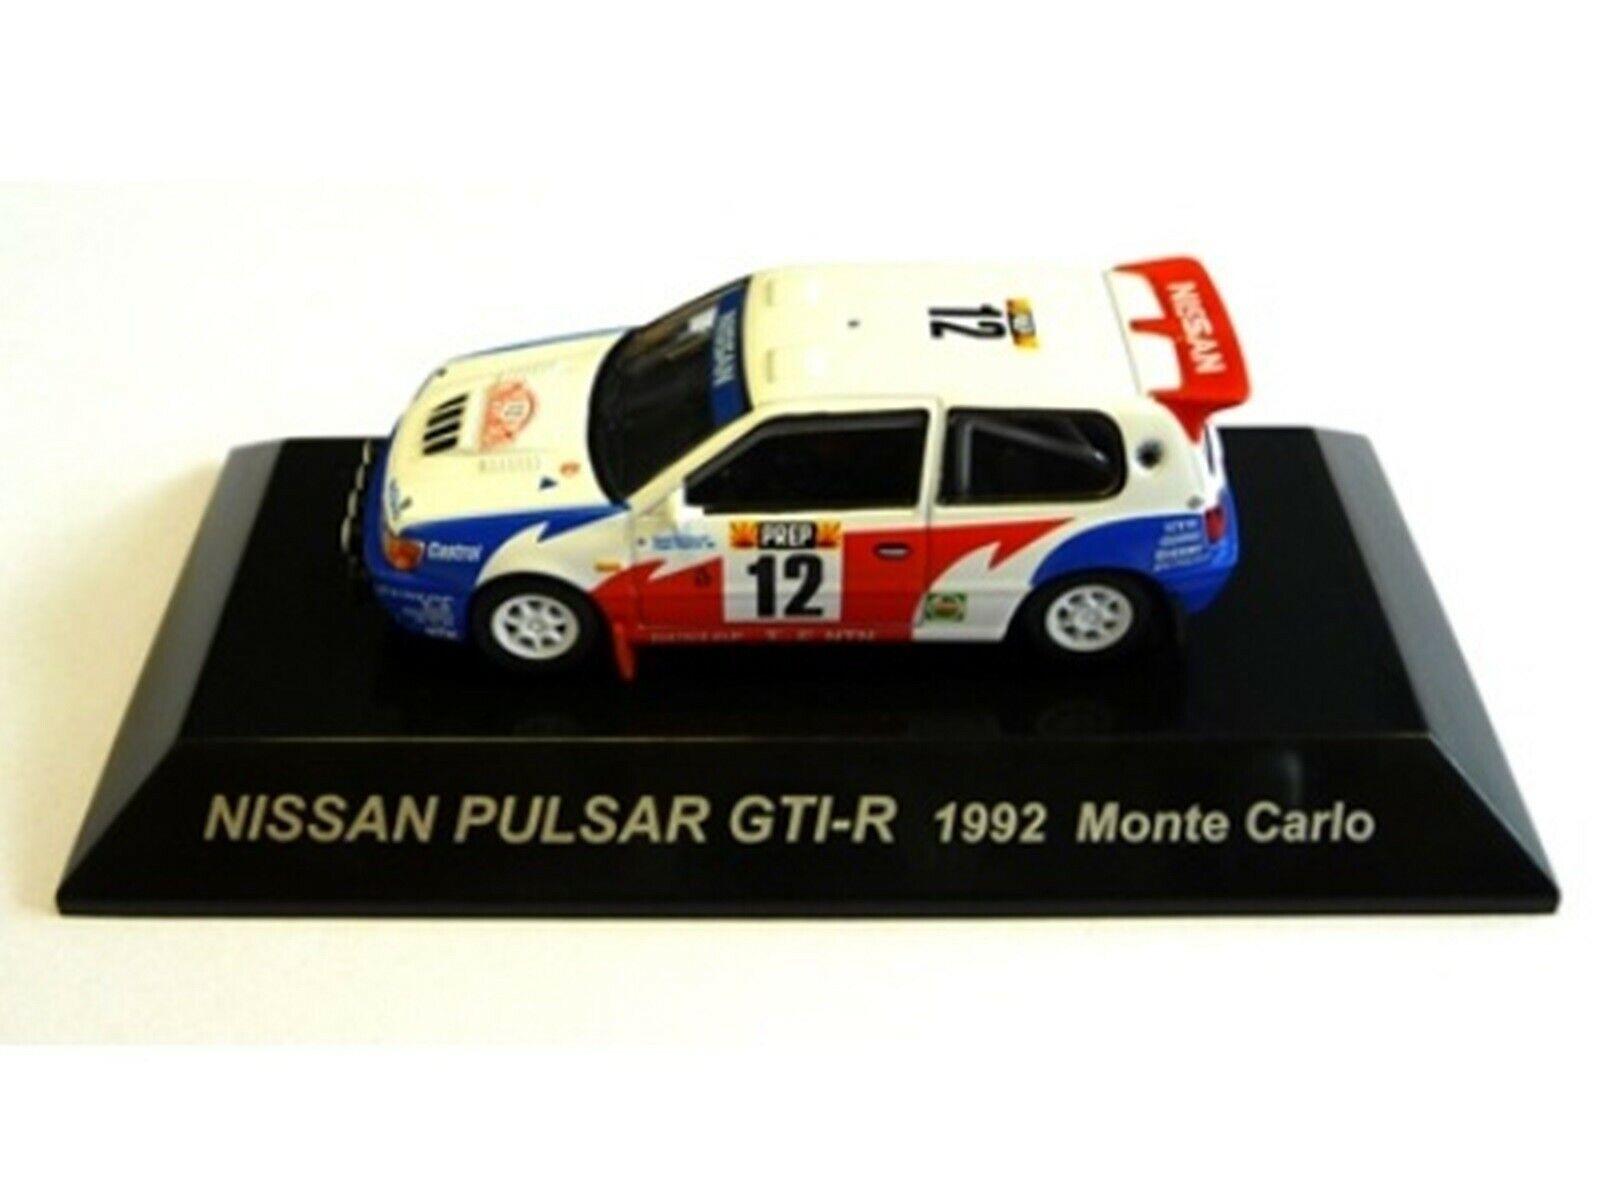 Wow extrêmement rare Nissan 1992 Pulsar GTI-R Makinen M. Carlo WRC 1 64 cm 'S KYOSHO